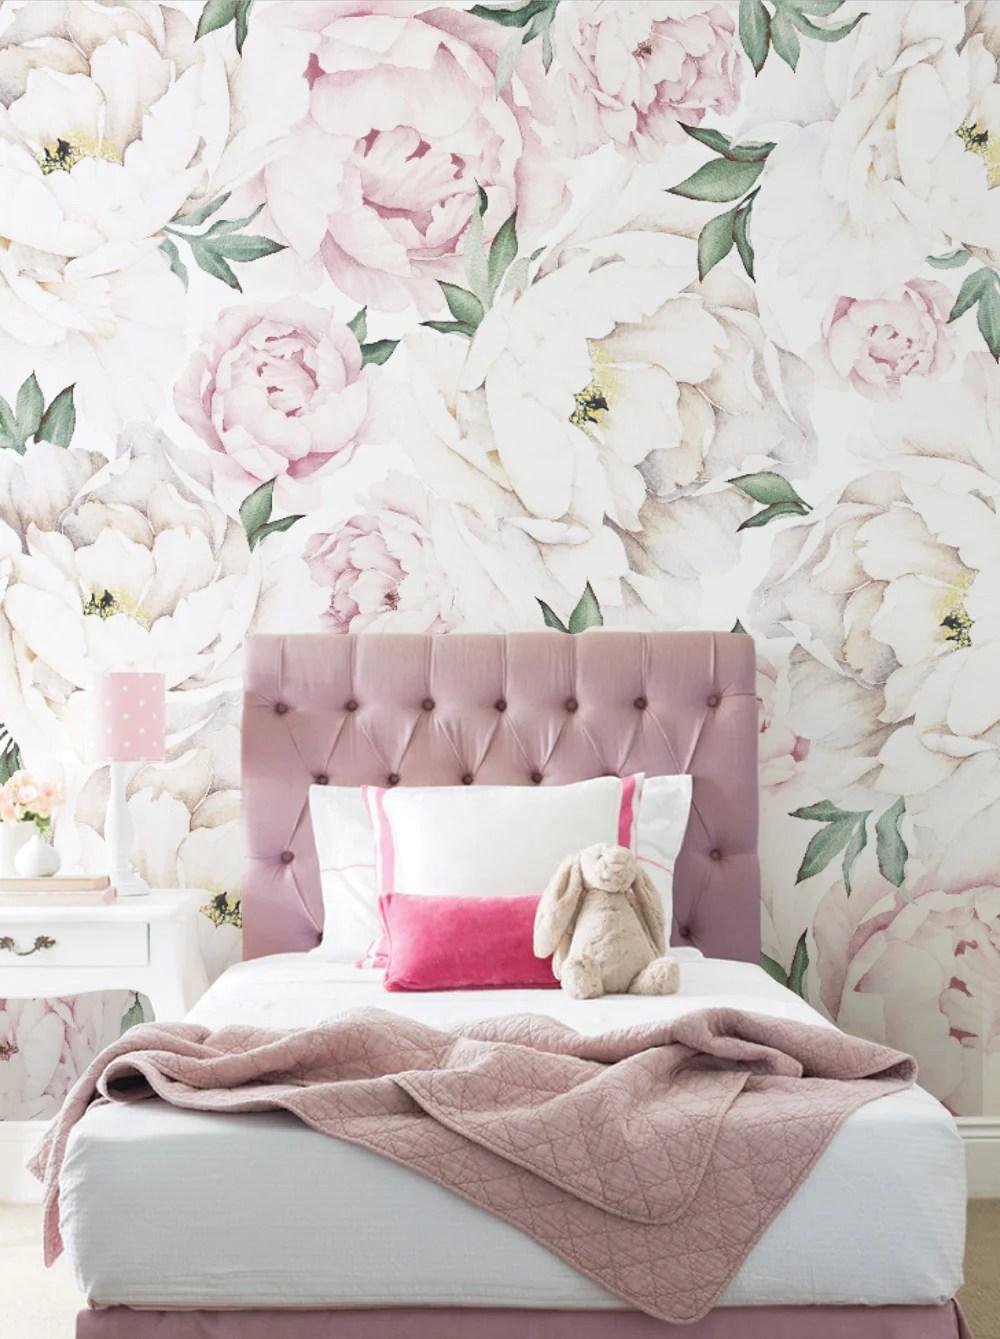 Peony Flower Mural Wall Art Wallpaper Peel And Stick